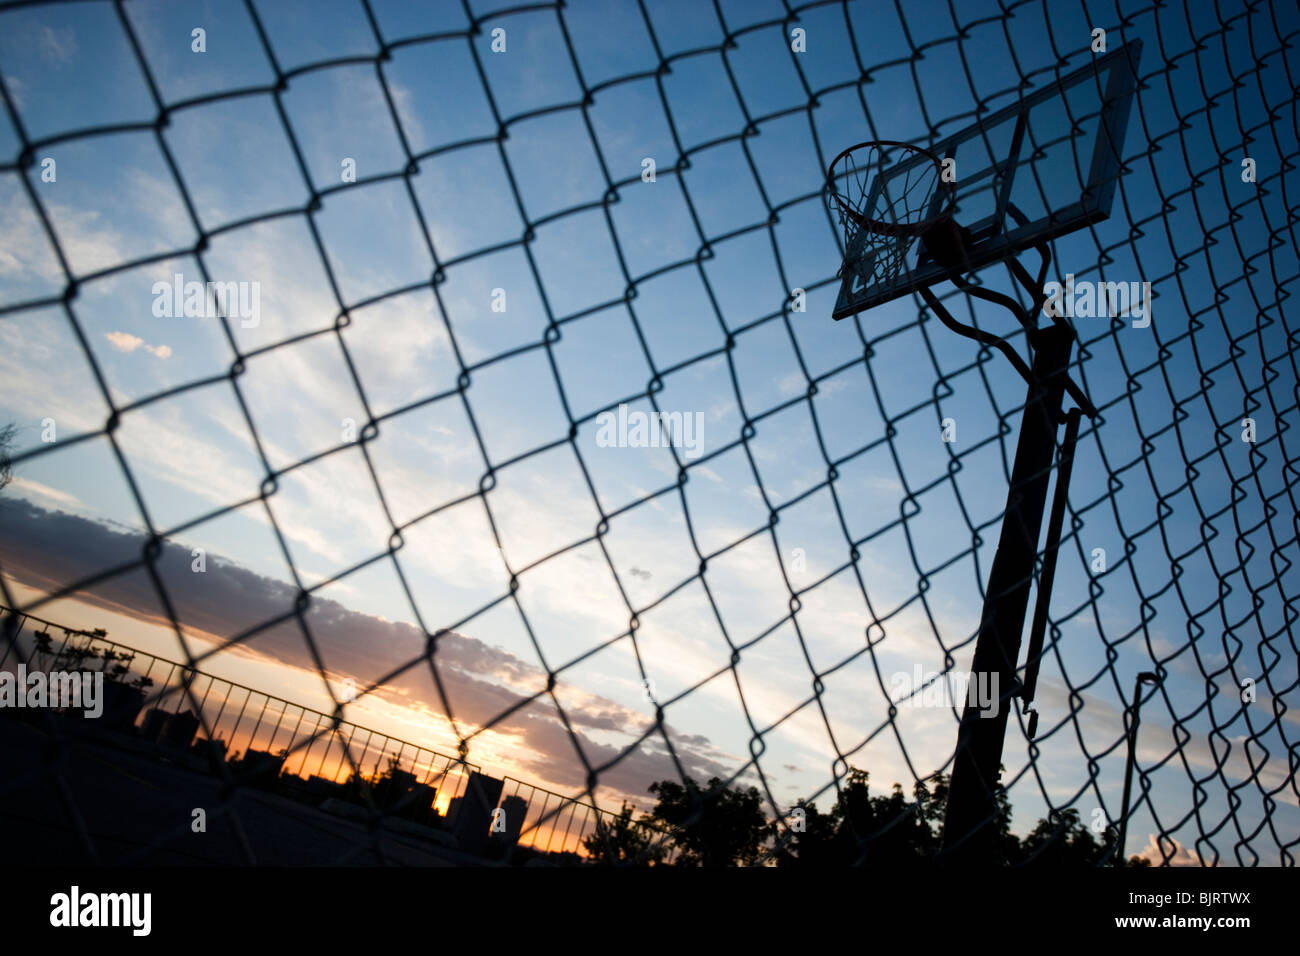 USA, Utah, Salt Lake City, panier de basket-ball contre sky, low angle view Photo Stock